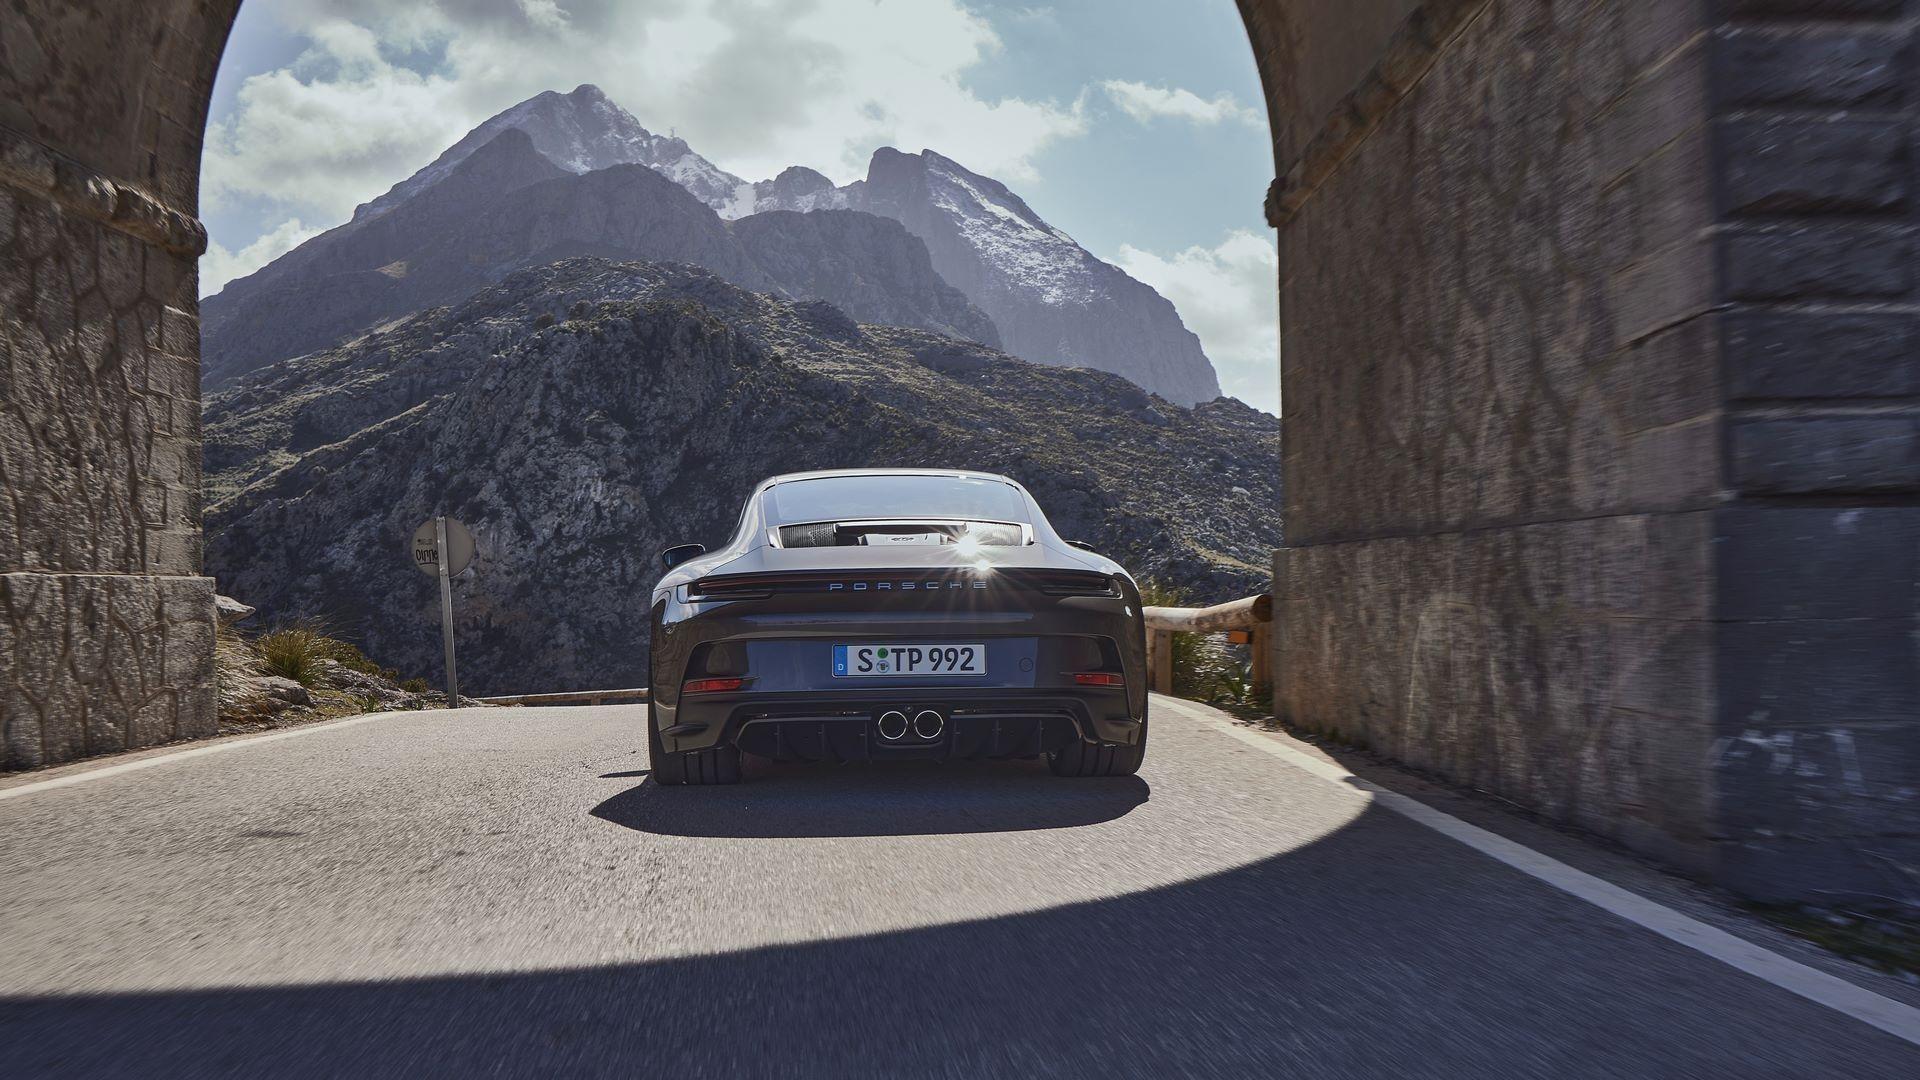 Porsche-911-GT3-Touring-Package-4